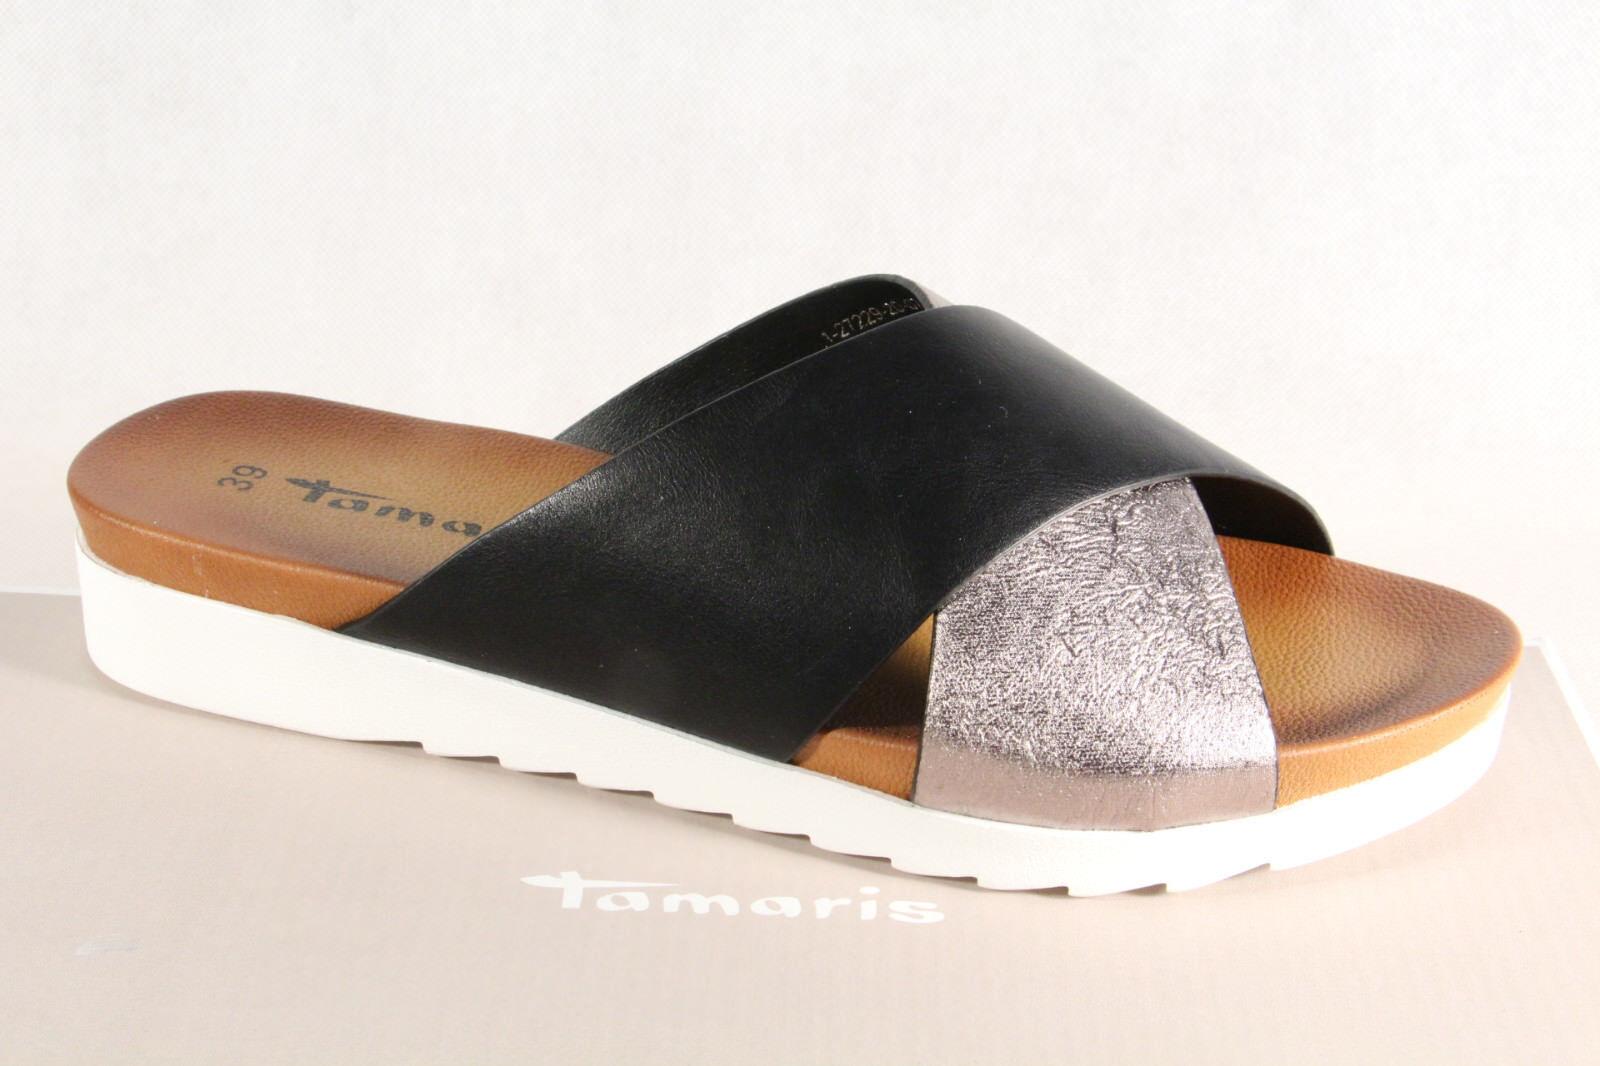 92e218d397e0 Tamaris Mules Mules Mule Slippers Black silver 5 for sale online